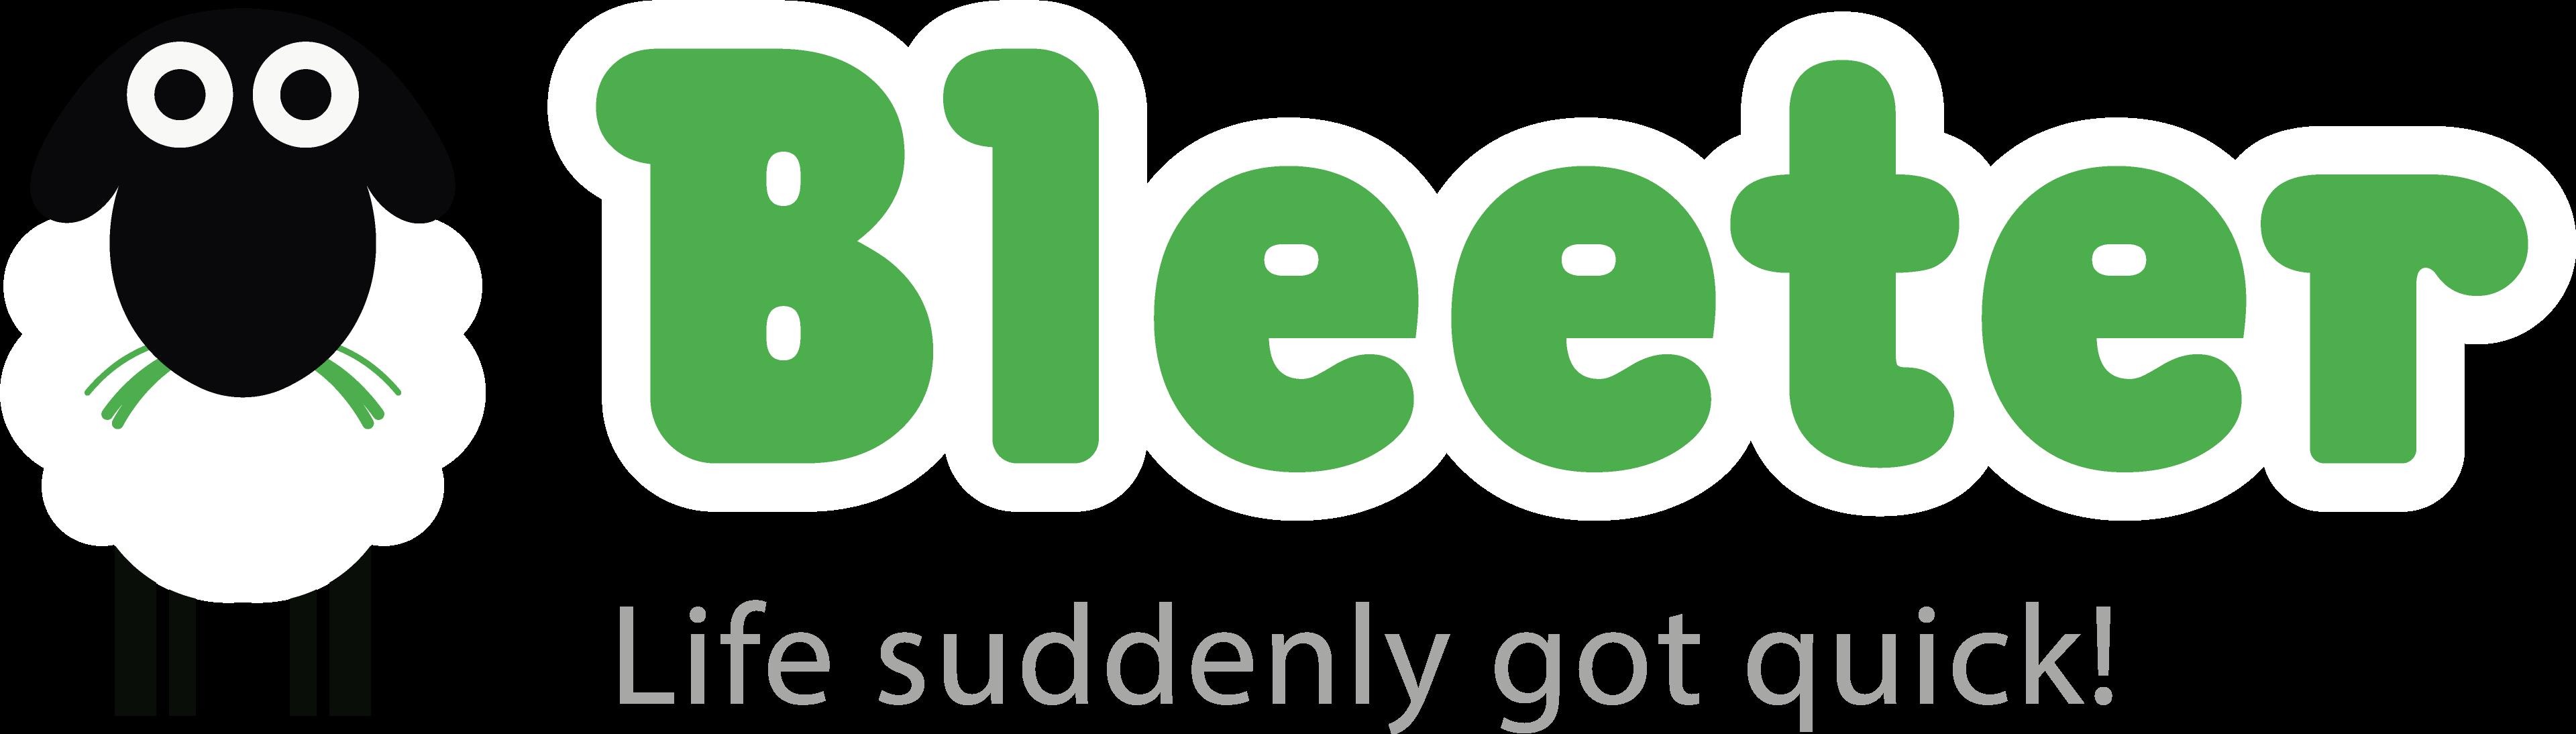 Archivo:250px-Bleeter.biz logotipo.png